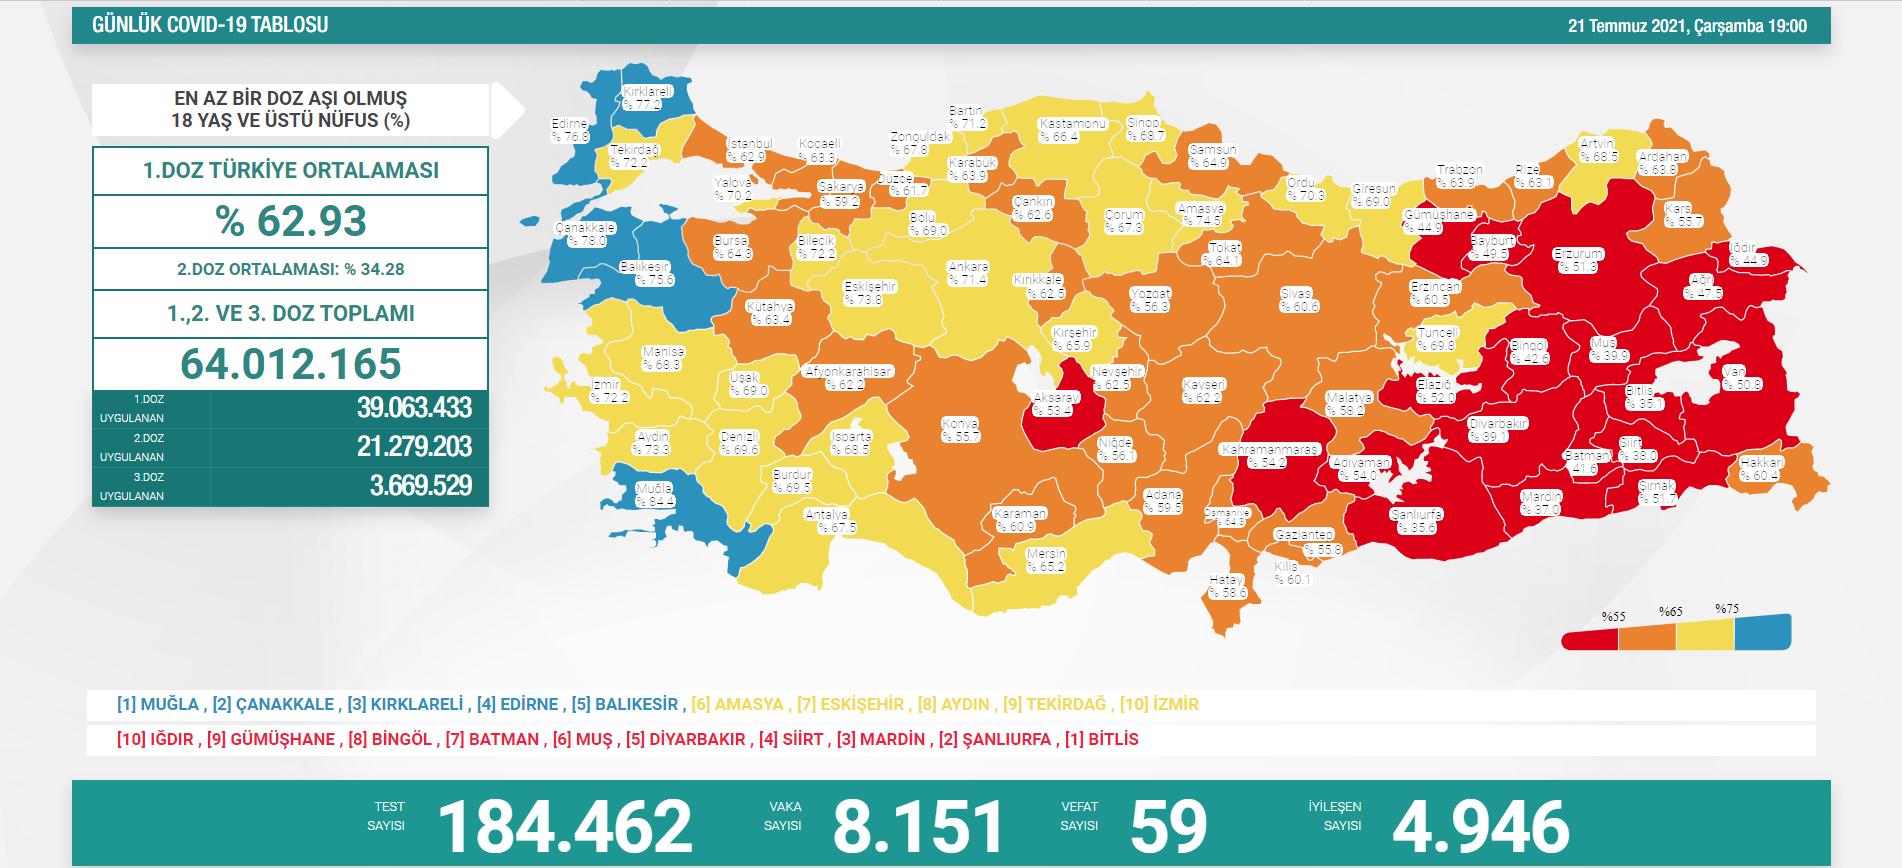 21-temmuz-turkiyede-koronavirus-tablosu.png